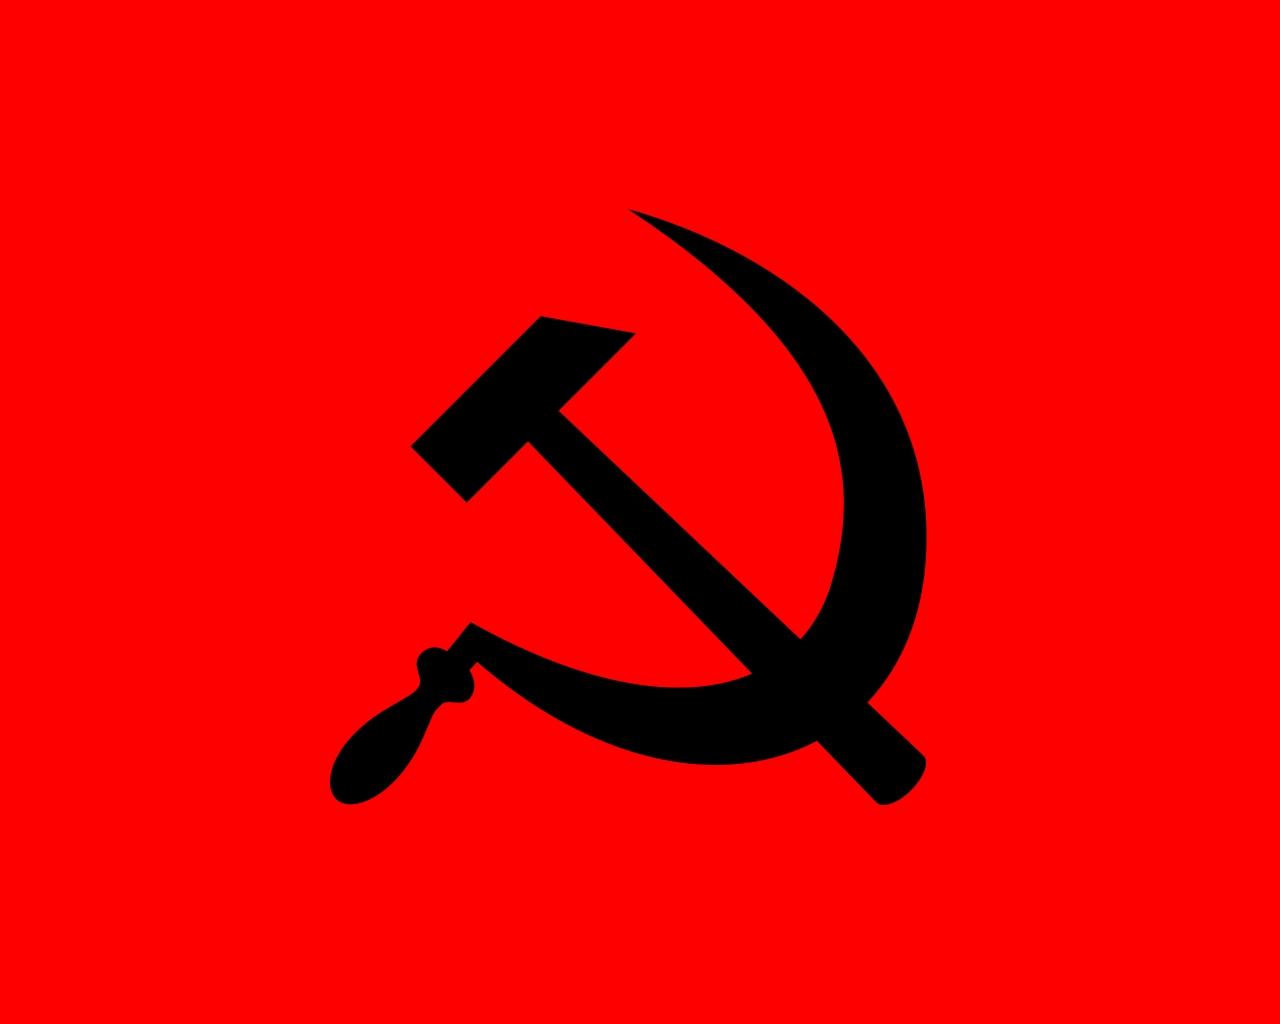 Obama's Pro Socialist logo by Conservatoons on DeviantArt